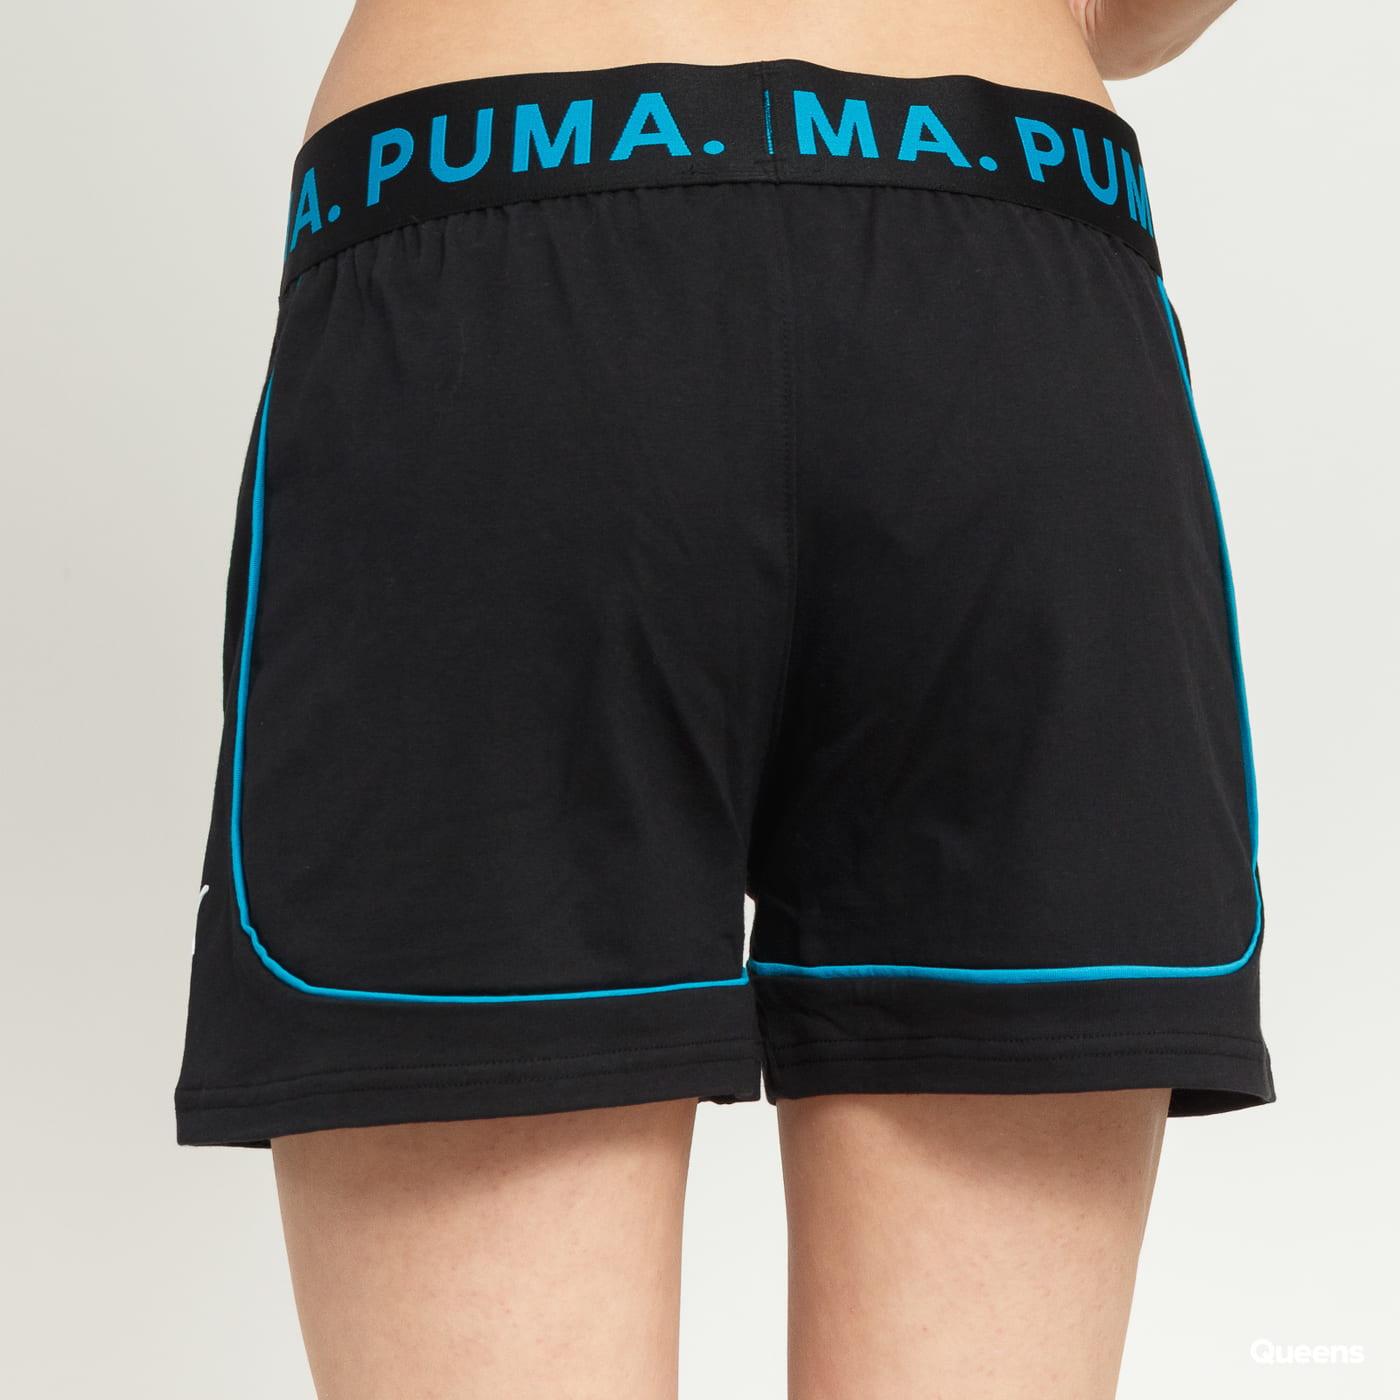 Puma Chase Shorts black